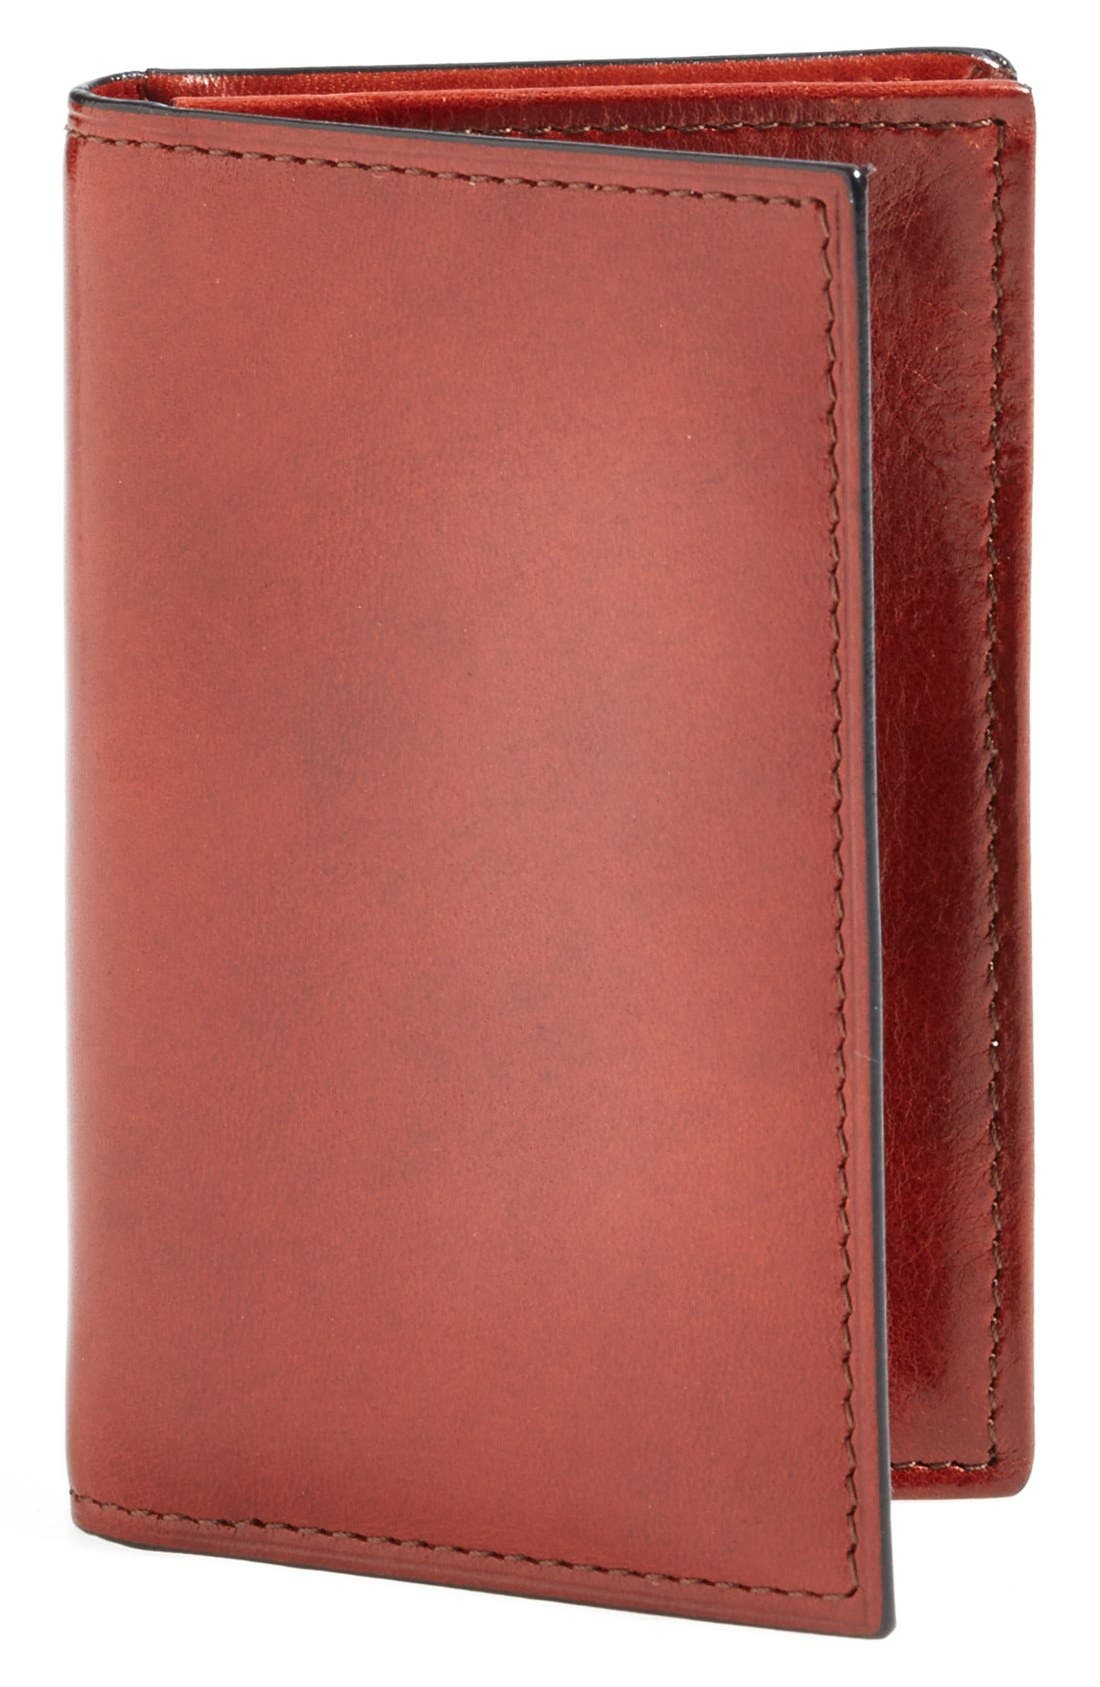 'Old Leather' Gusset Wallet,                         Main,                         color, COGNAC